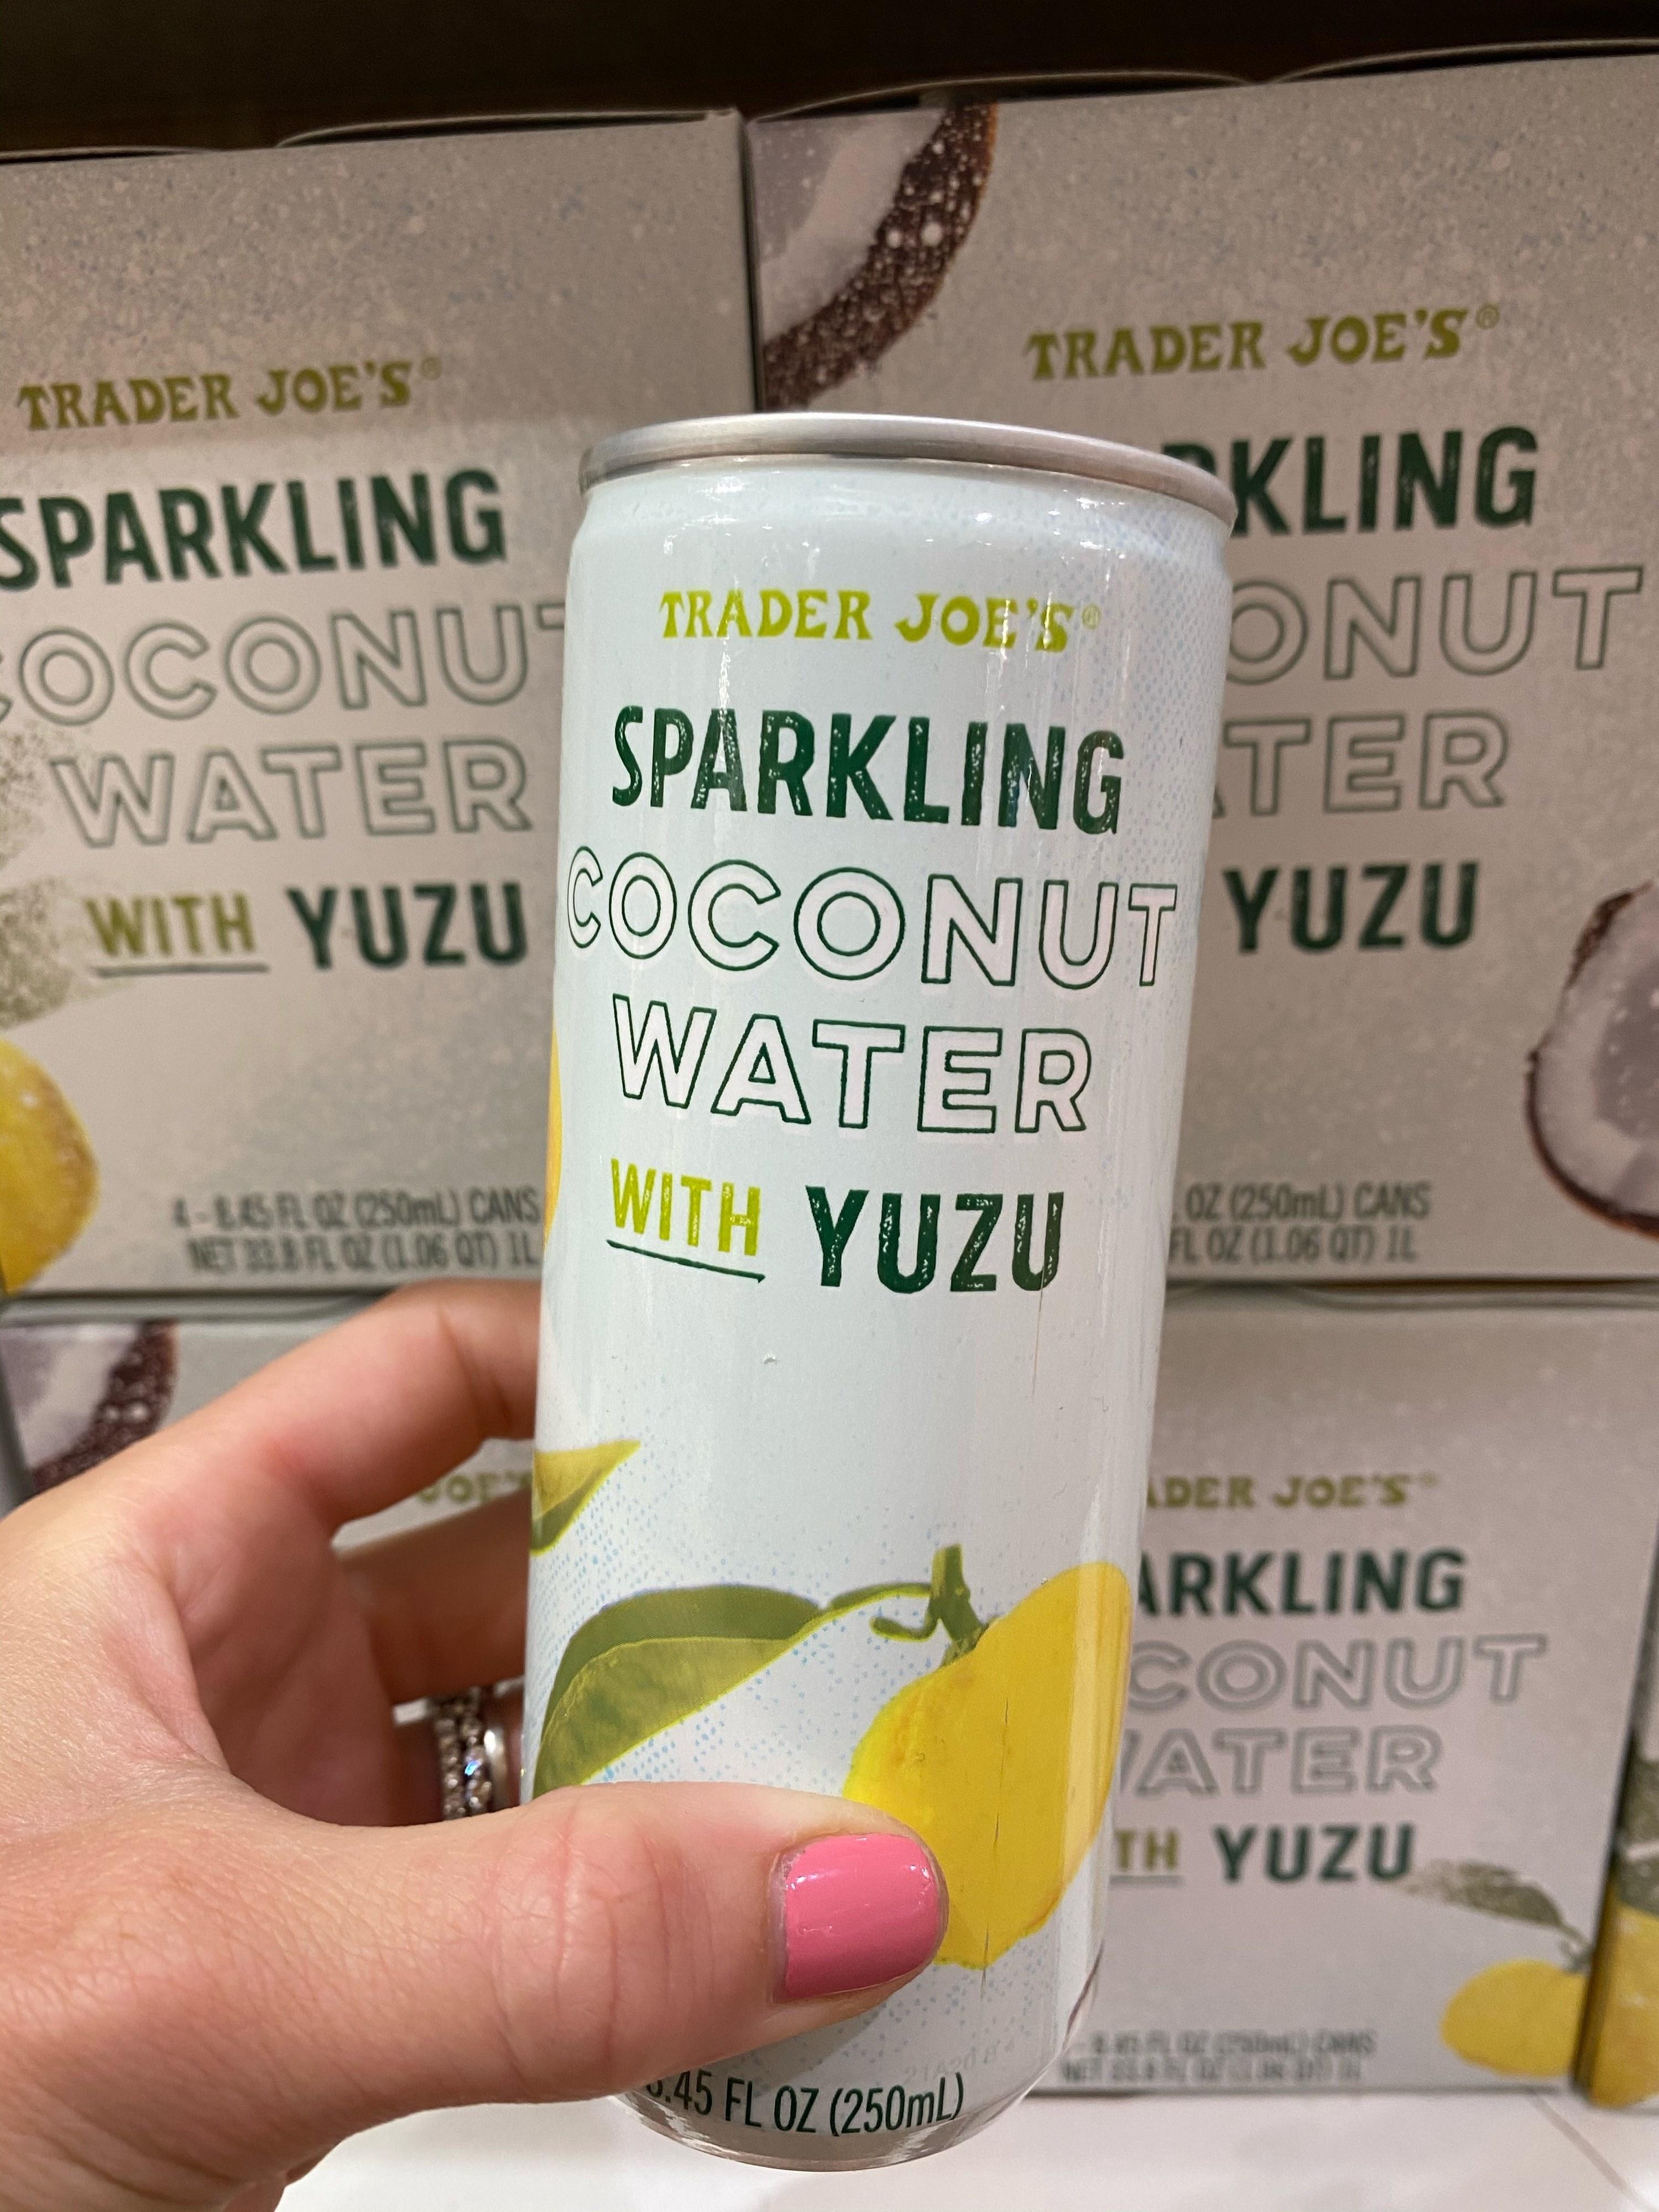 Sparkling Coconut Water With Yuzu